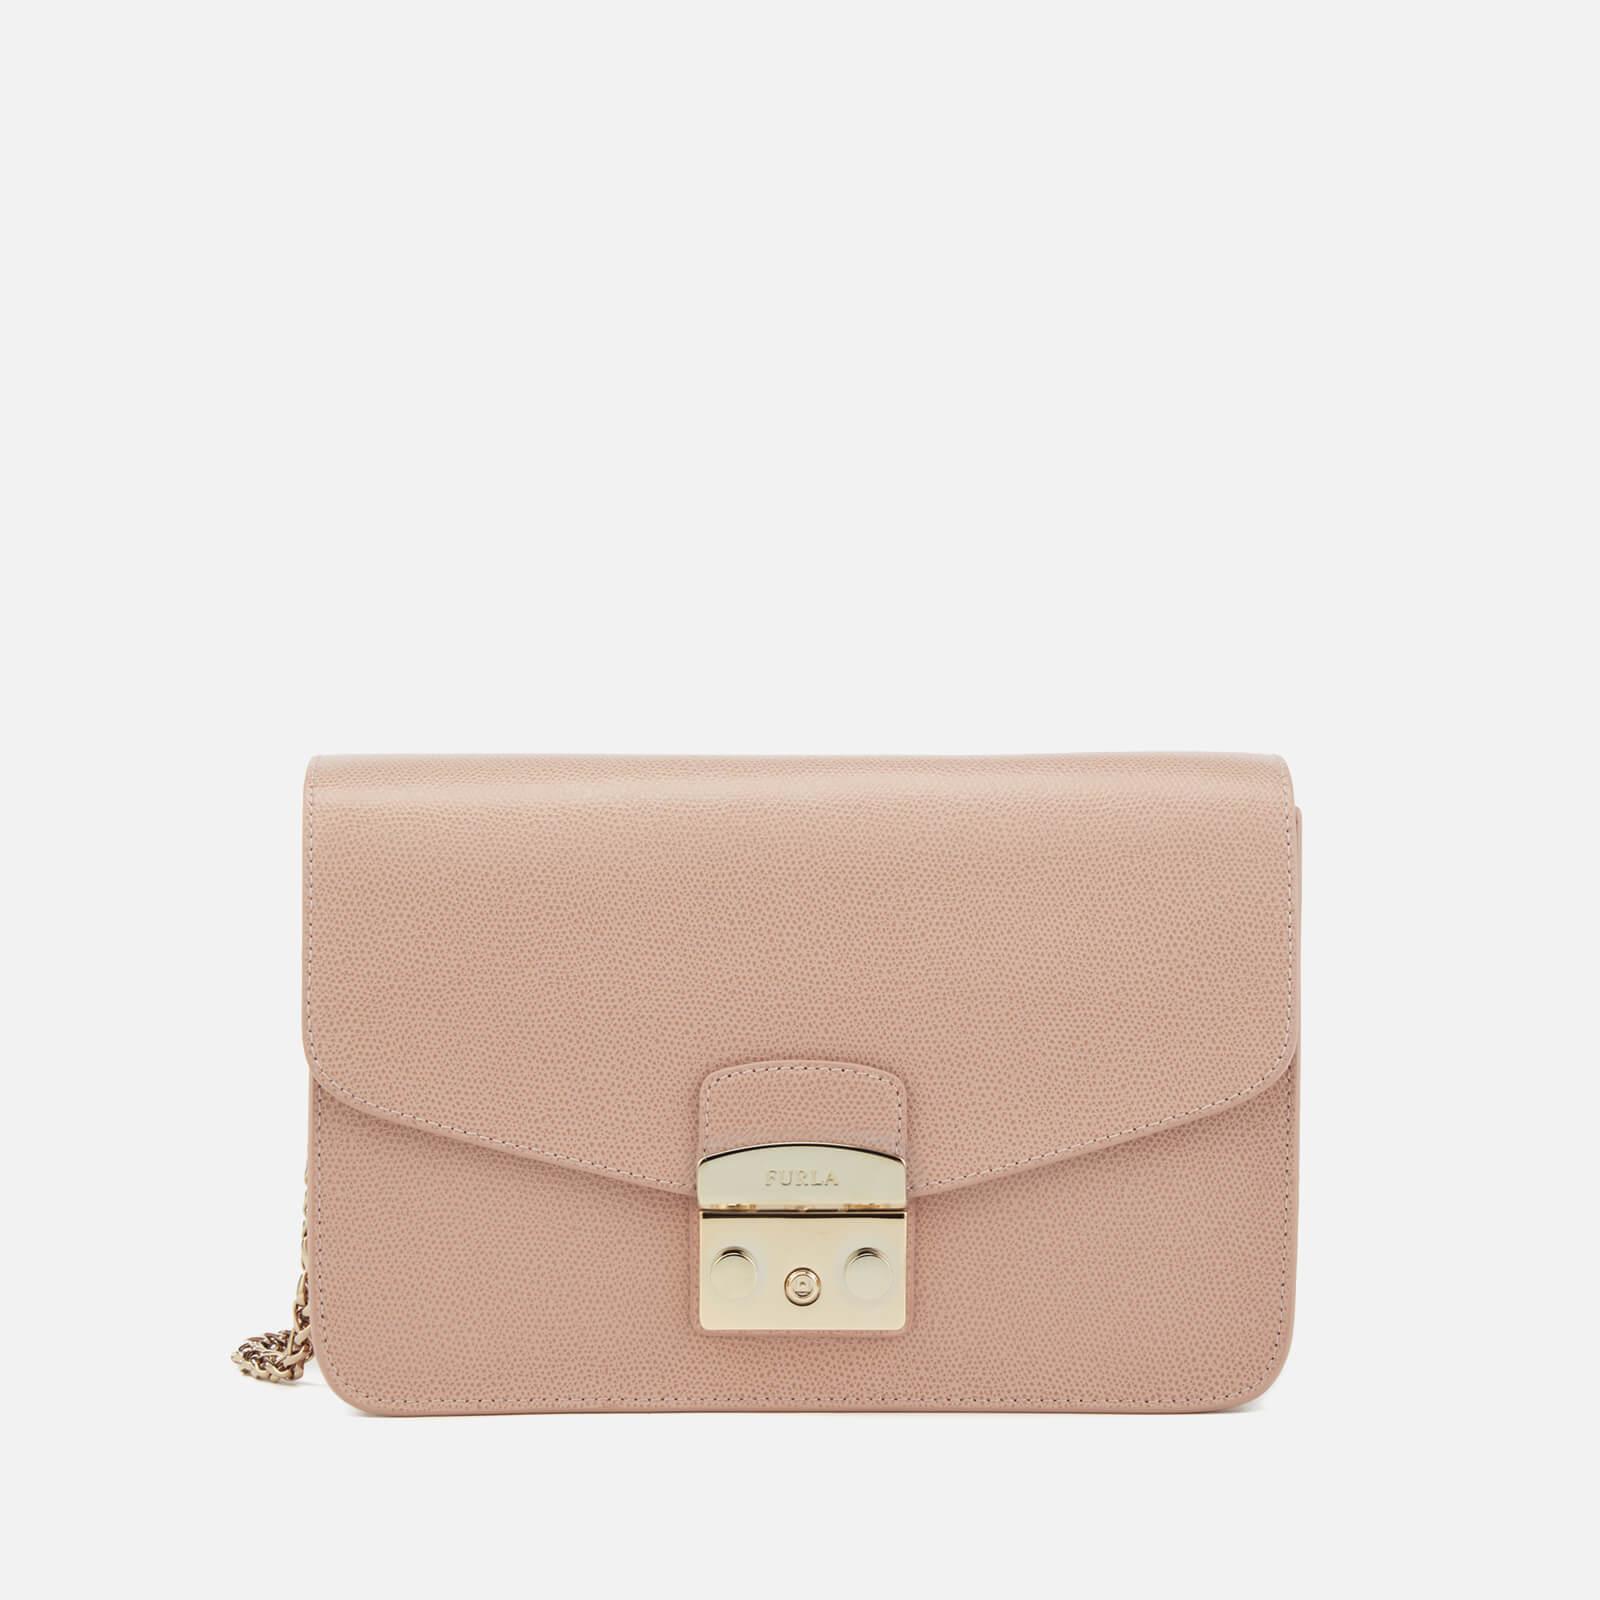 47761ffa2d9ce Furla Women s Metropolis Shoulder Bag - Moonstone - Free UK Delivery over  £50